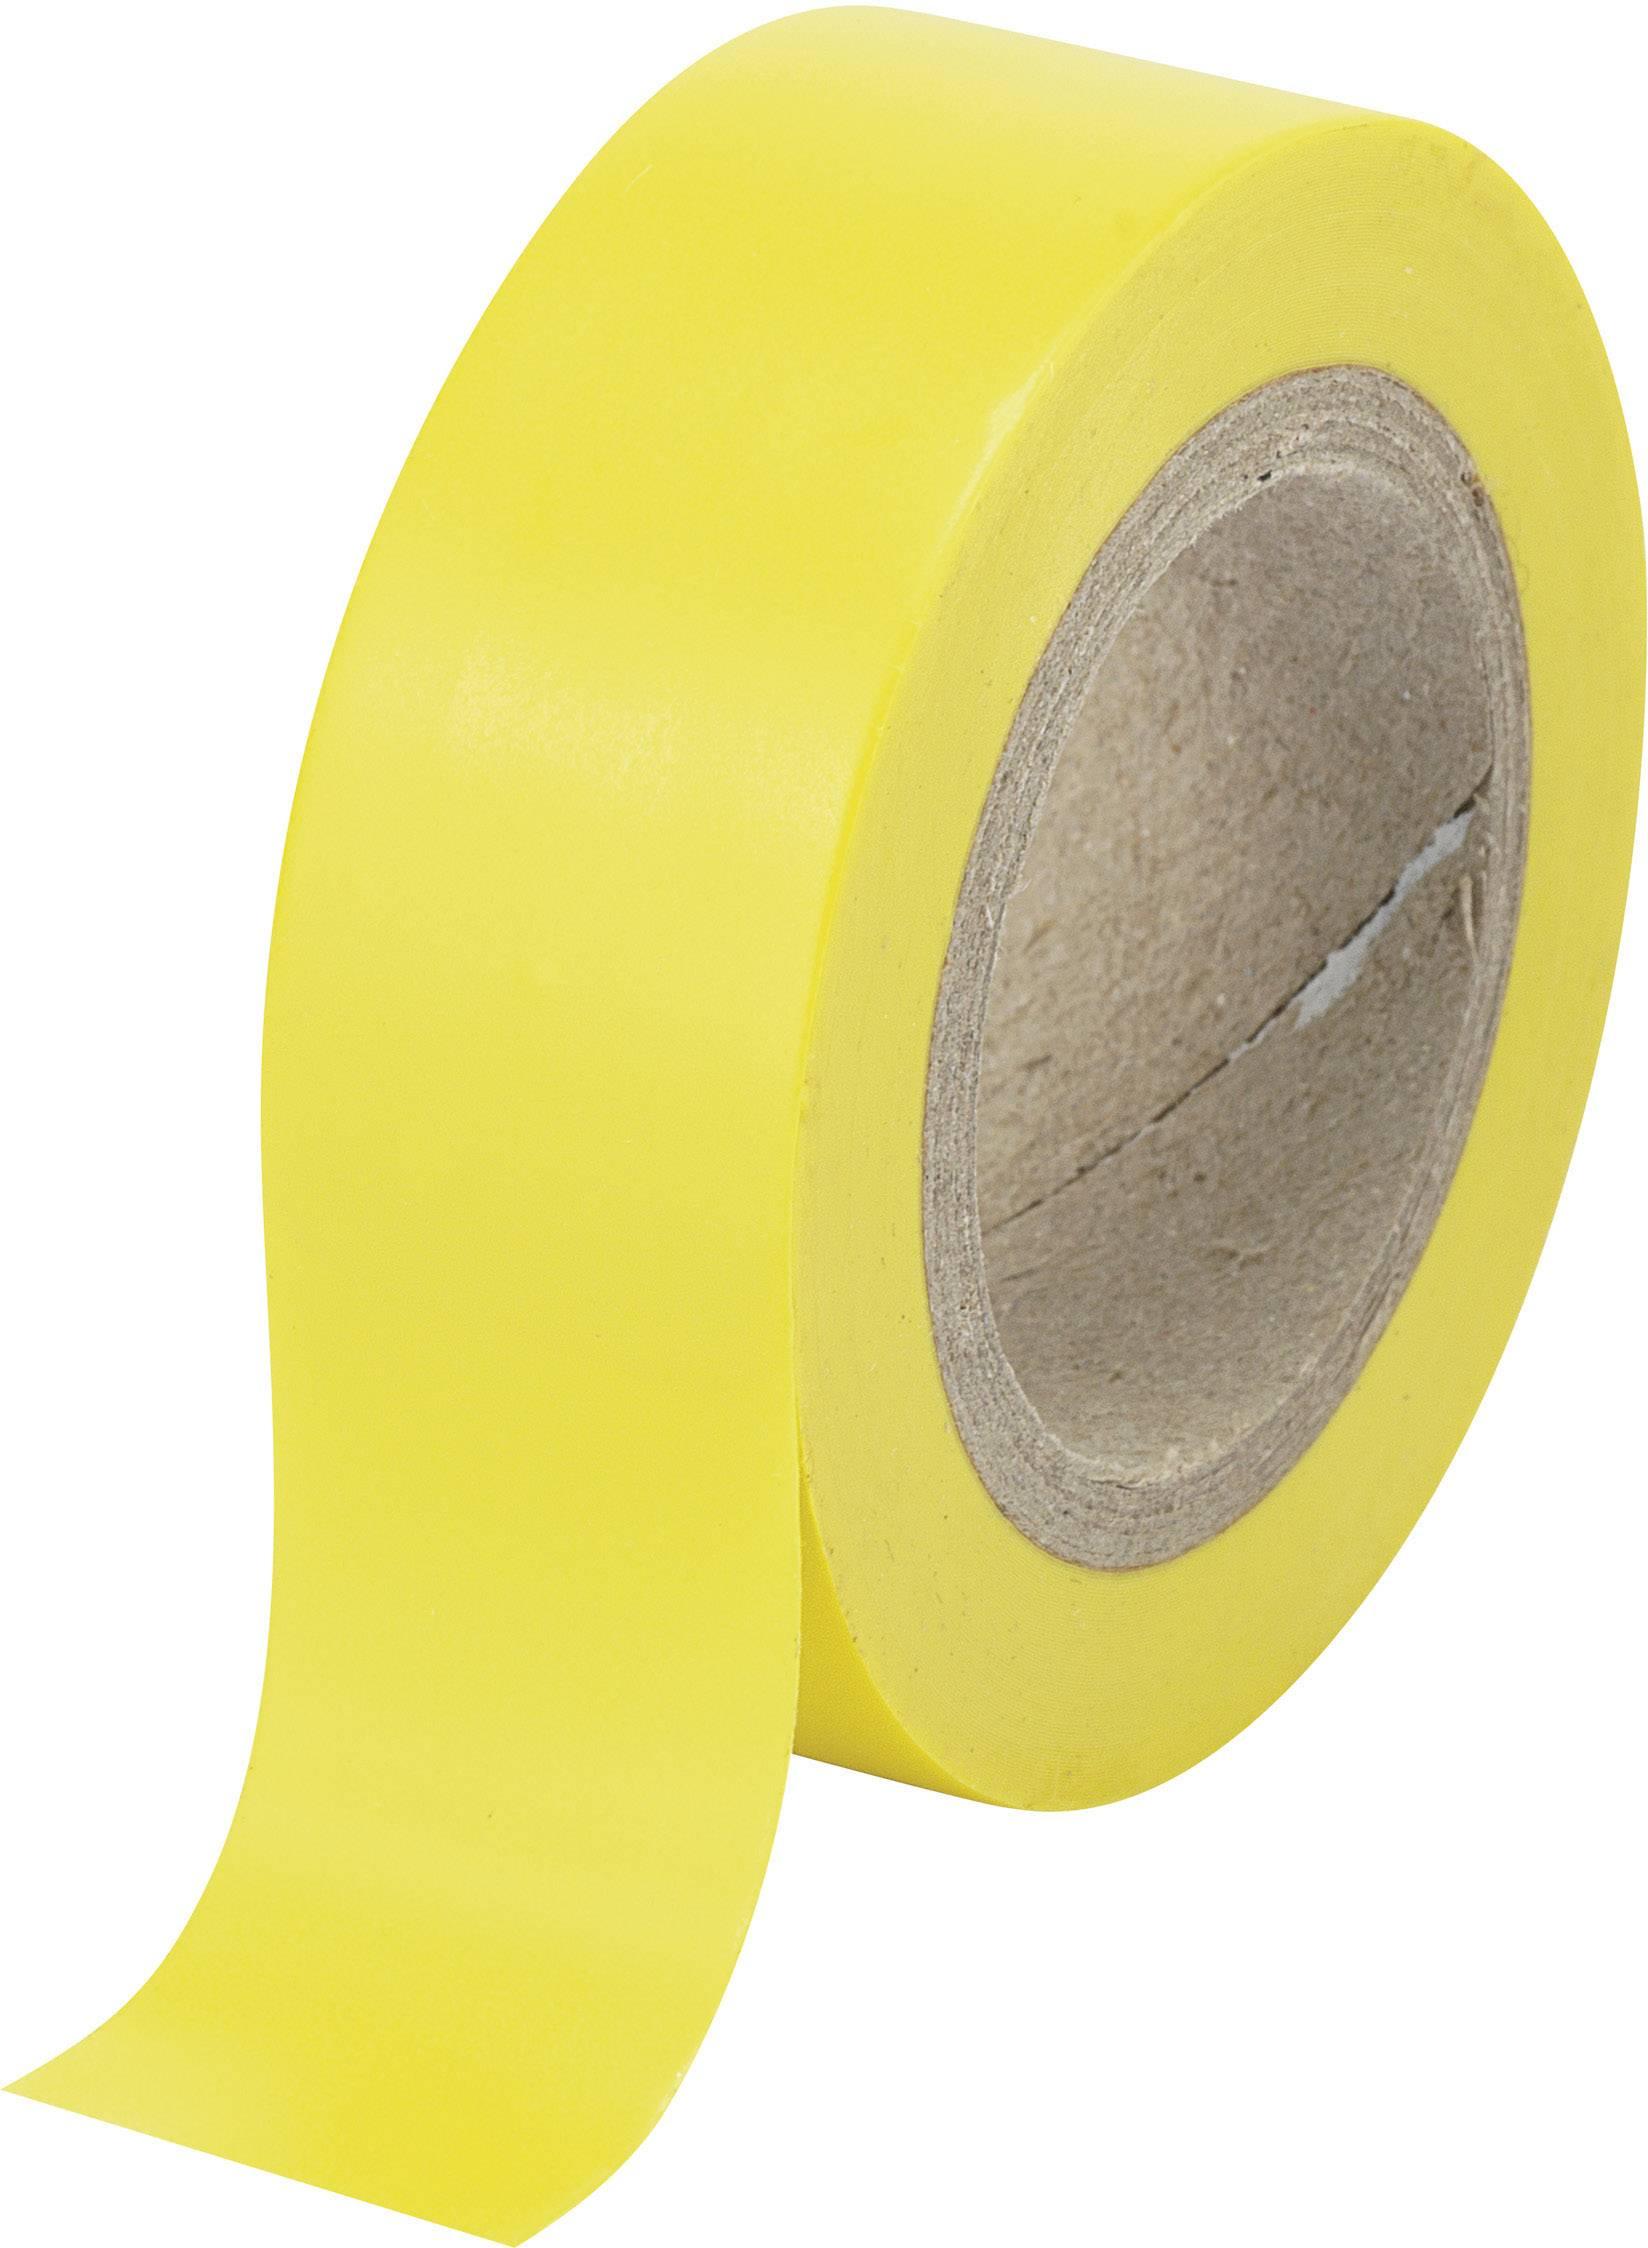 Izolační páska TRU COMPONENTS SW12-014YL 1564020, (d x š) 25 m x 19 mm, žlutá, 1 role